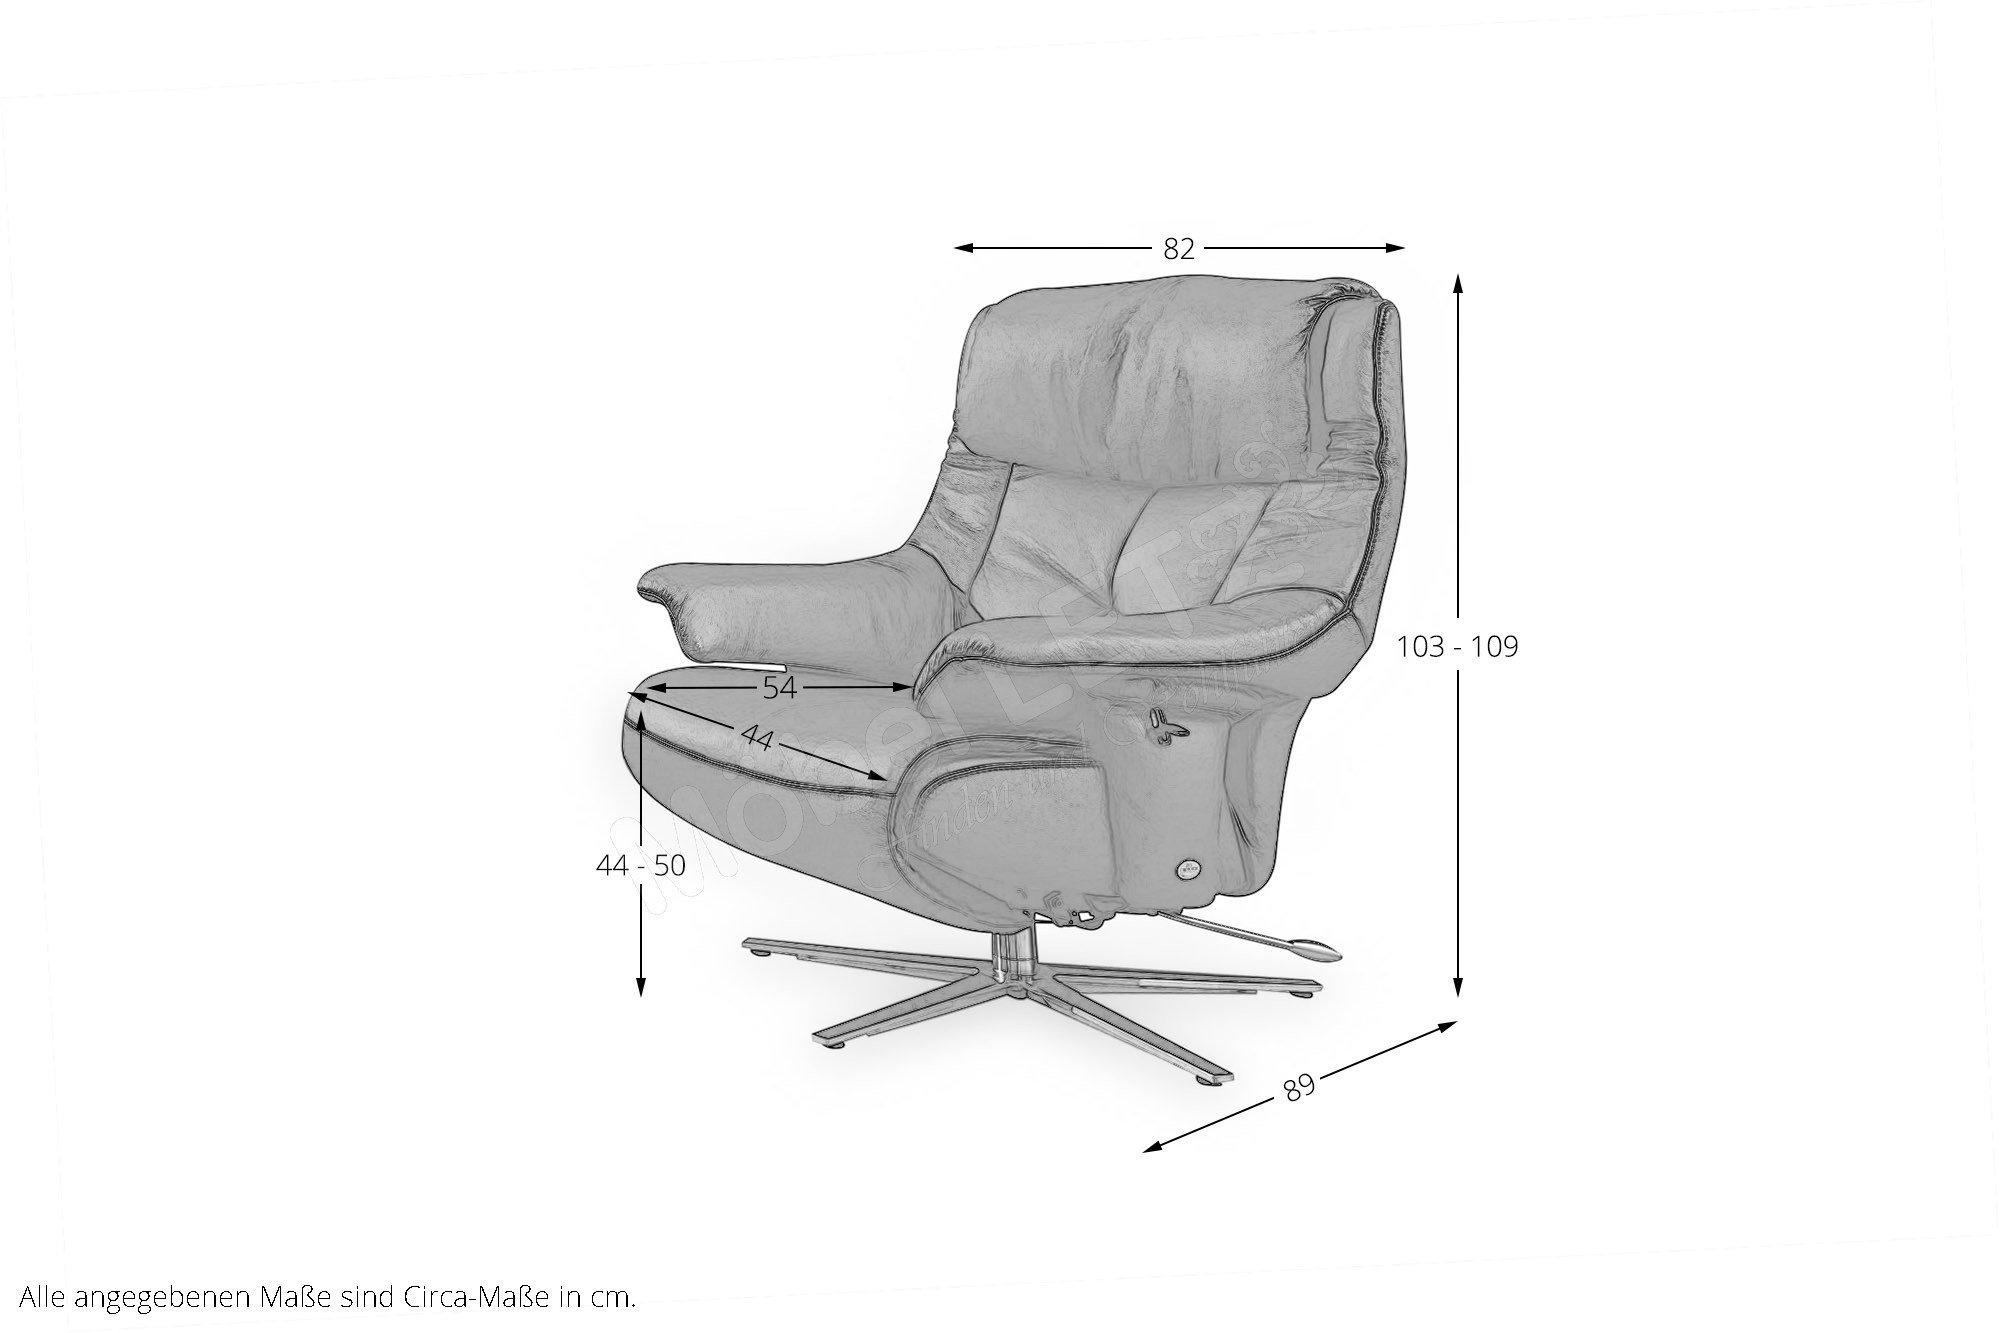 himolla 7501 relaxsessel schwarz m bel letz ihr online shop. Black Bedroom Furniture Sets. Home Design Ideas